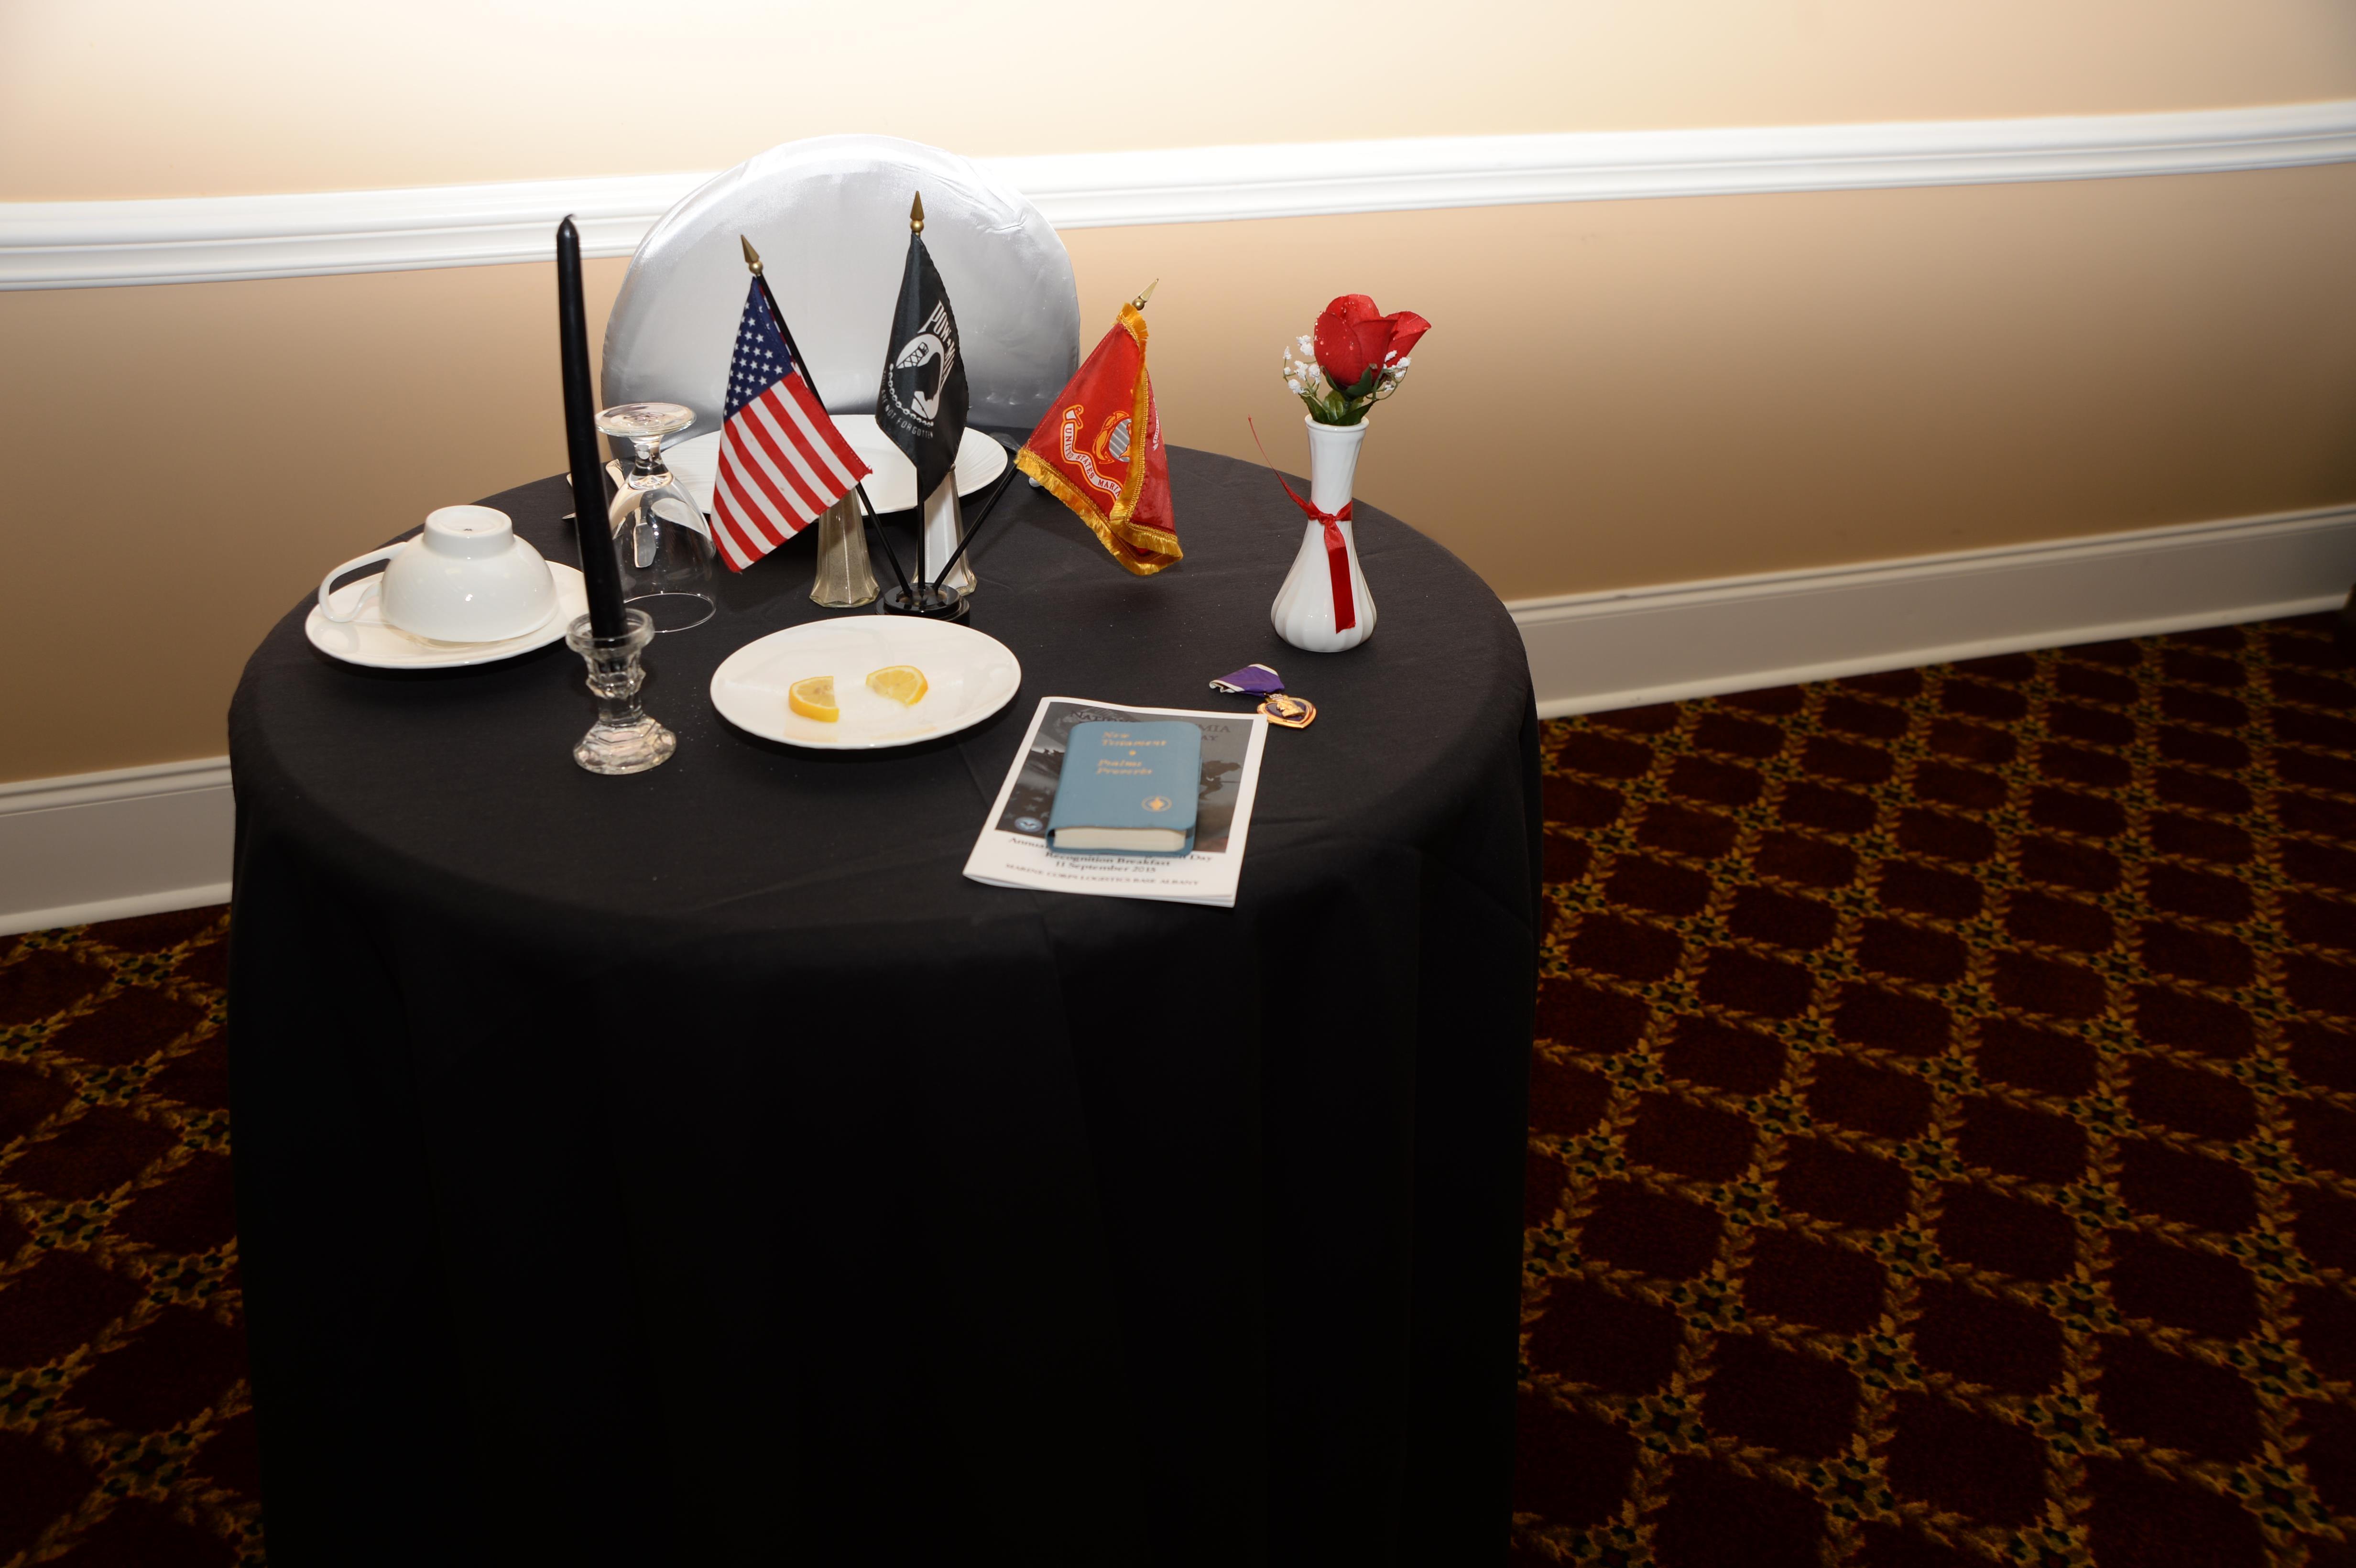 Download Hi-Res Photo ... & POW-MIA ceremony marks sad benchmark u003e Marine Corps Logistics Base ...